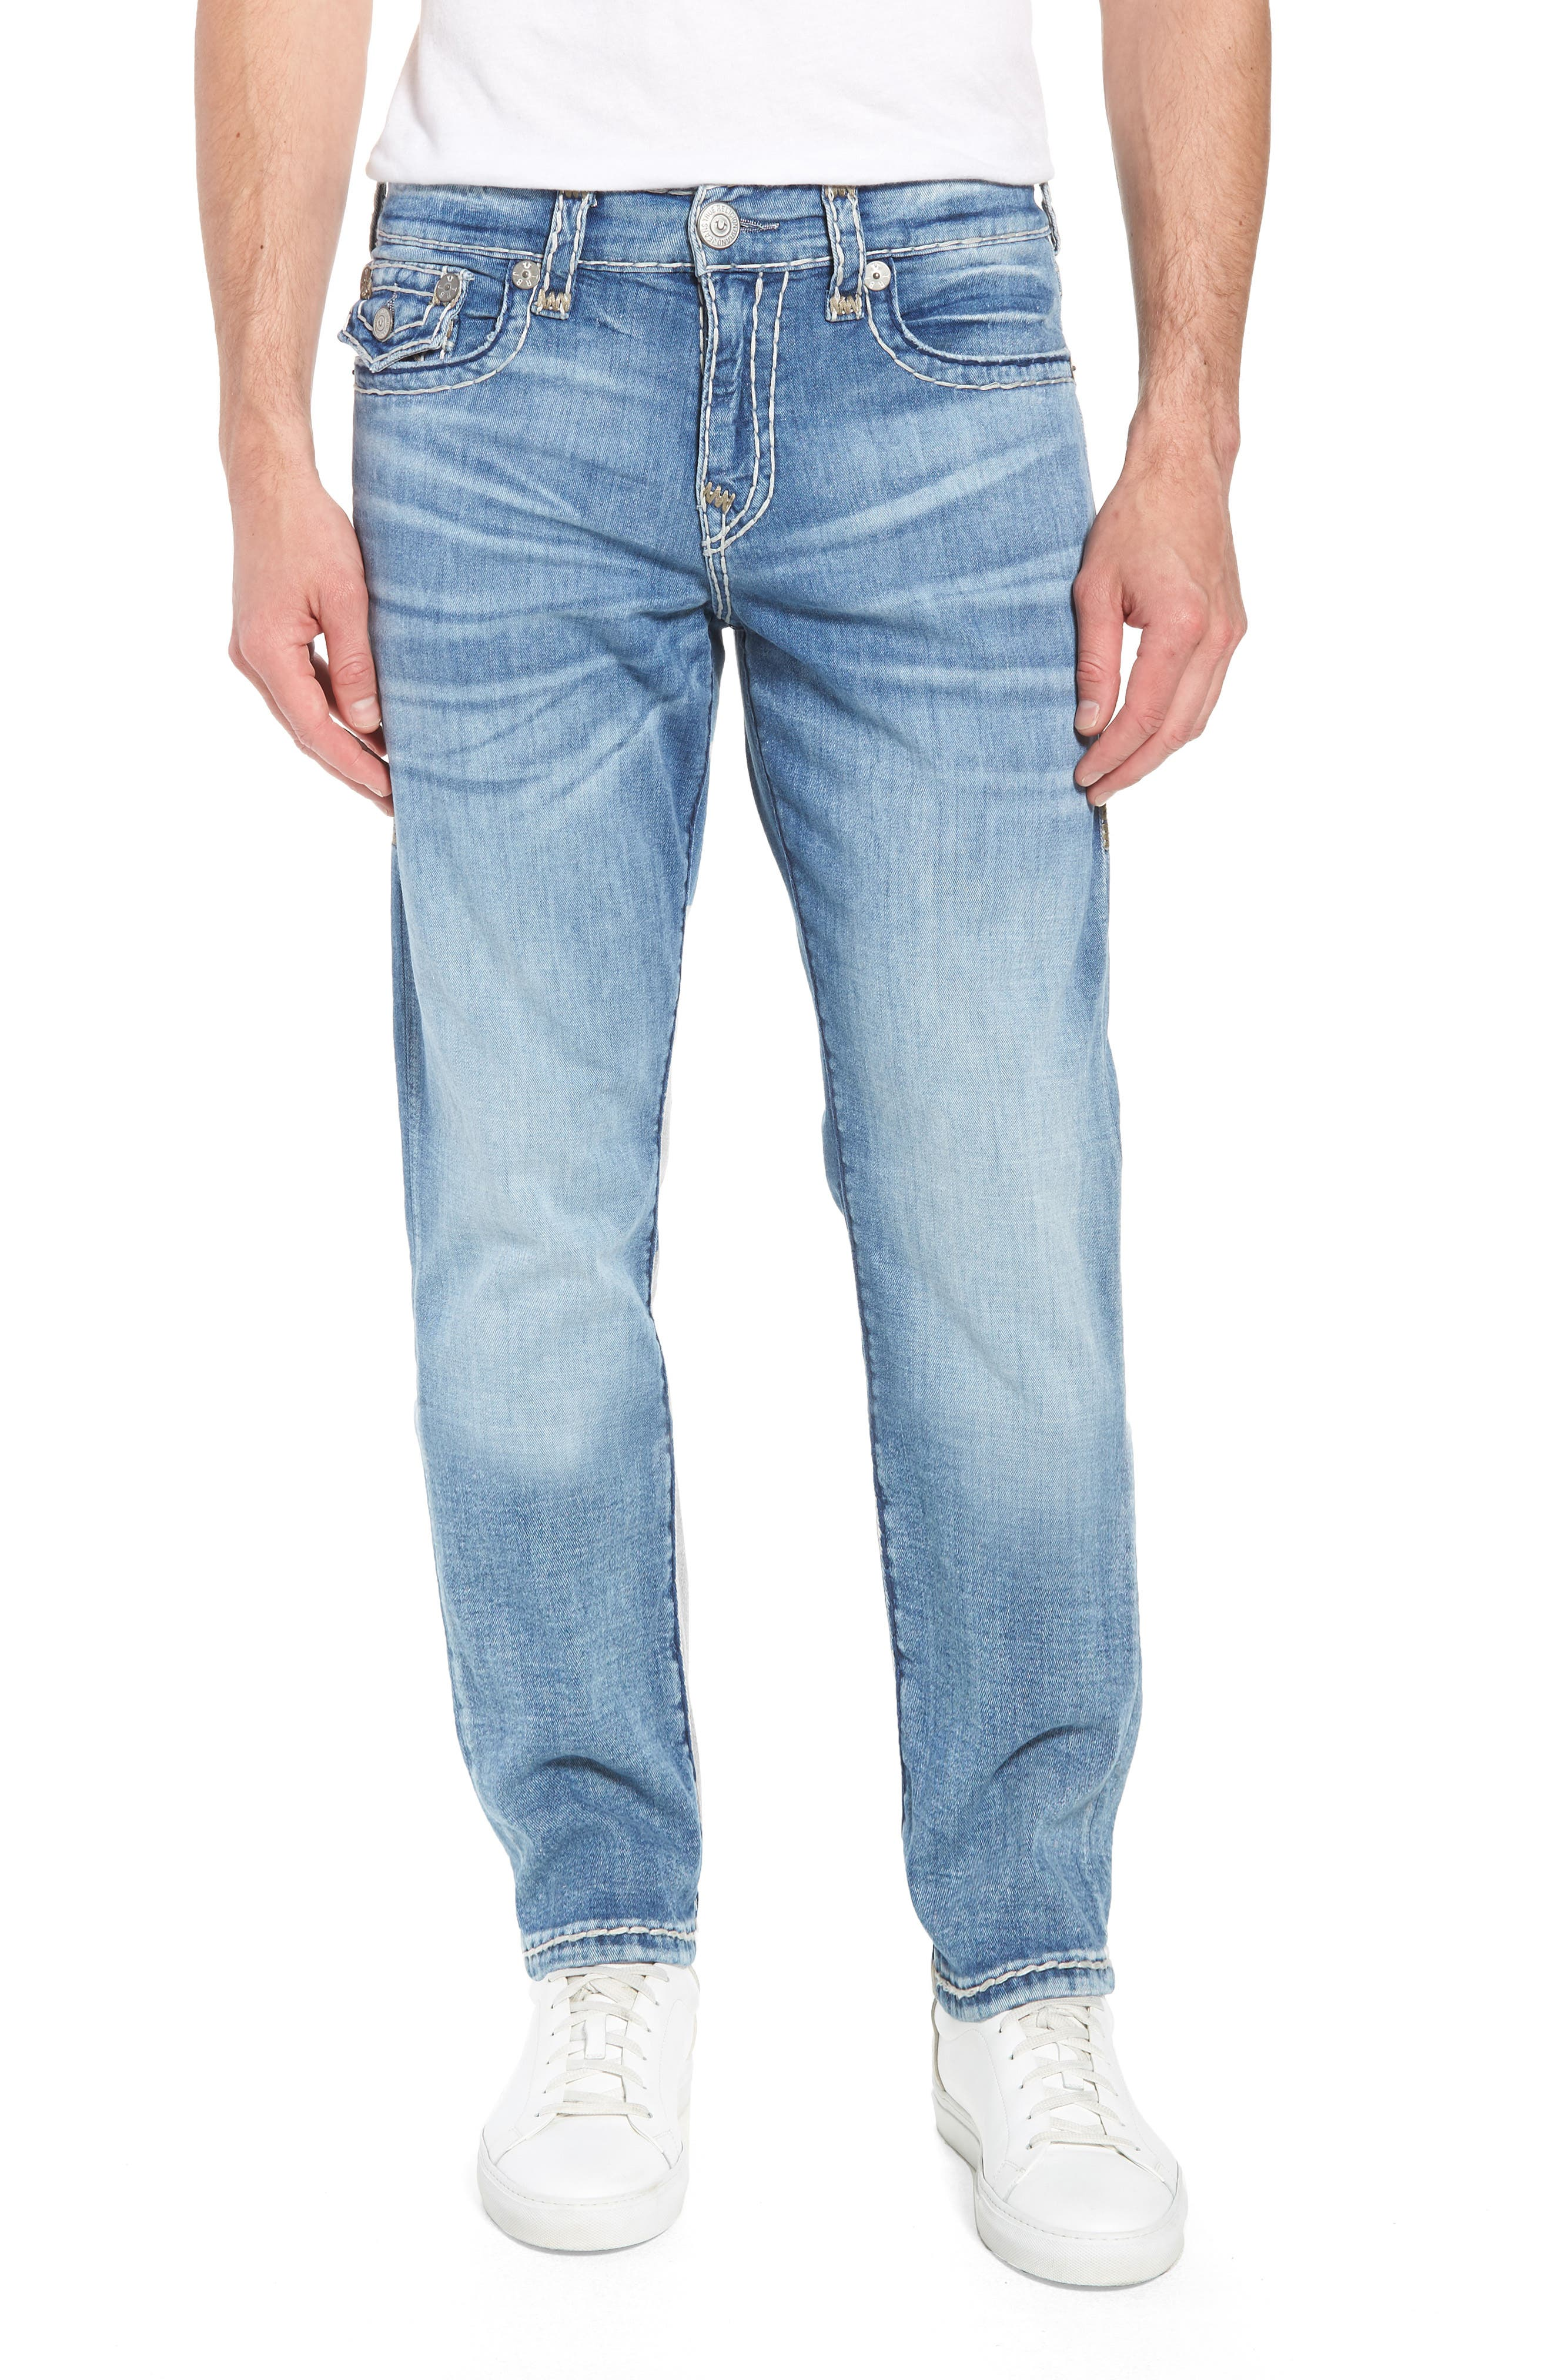 True Religion Brand Jeans Geno Straight Leg Jeans (Satellite)